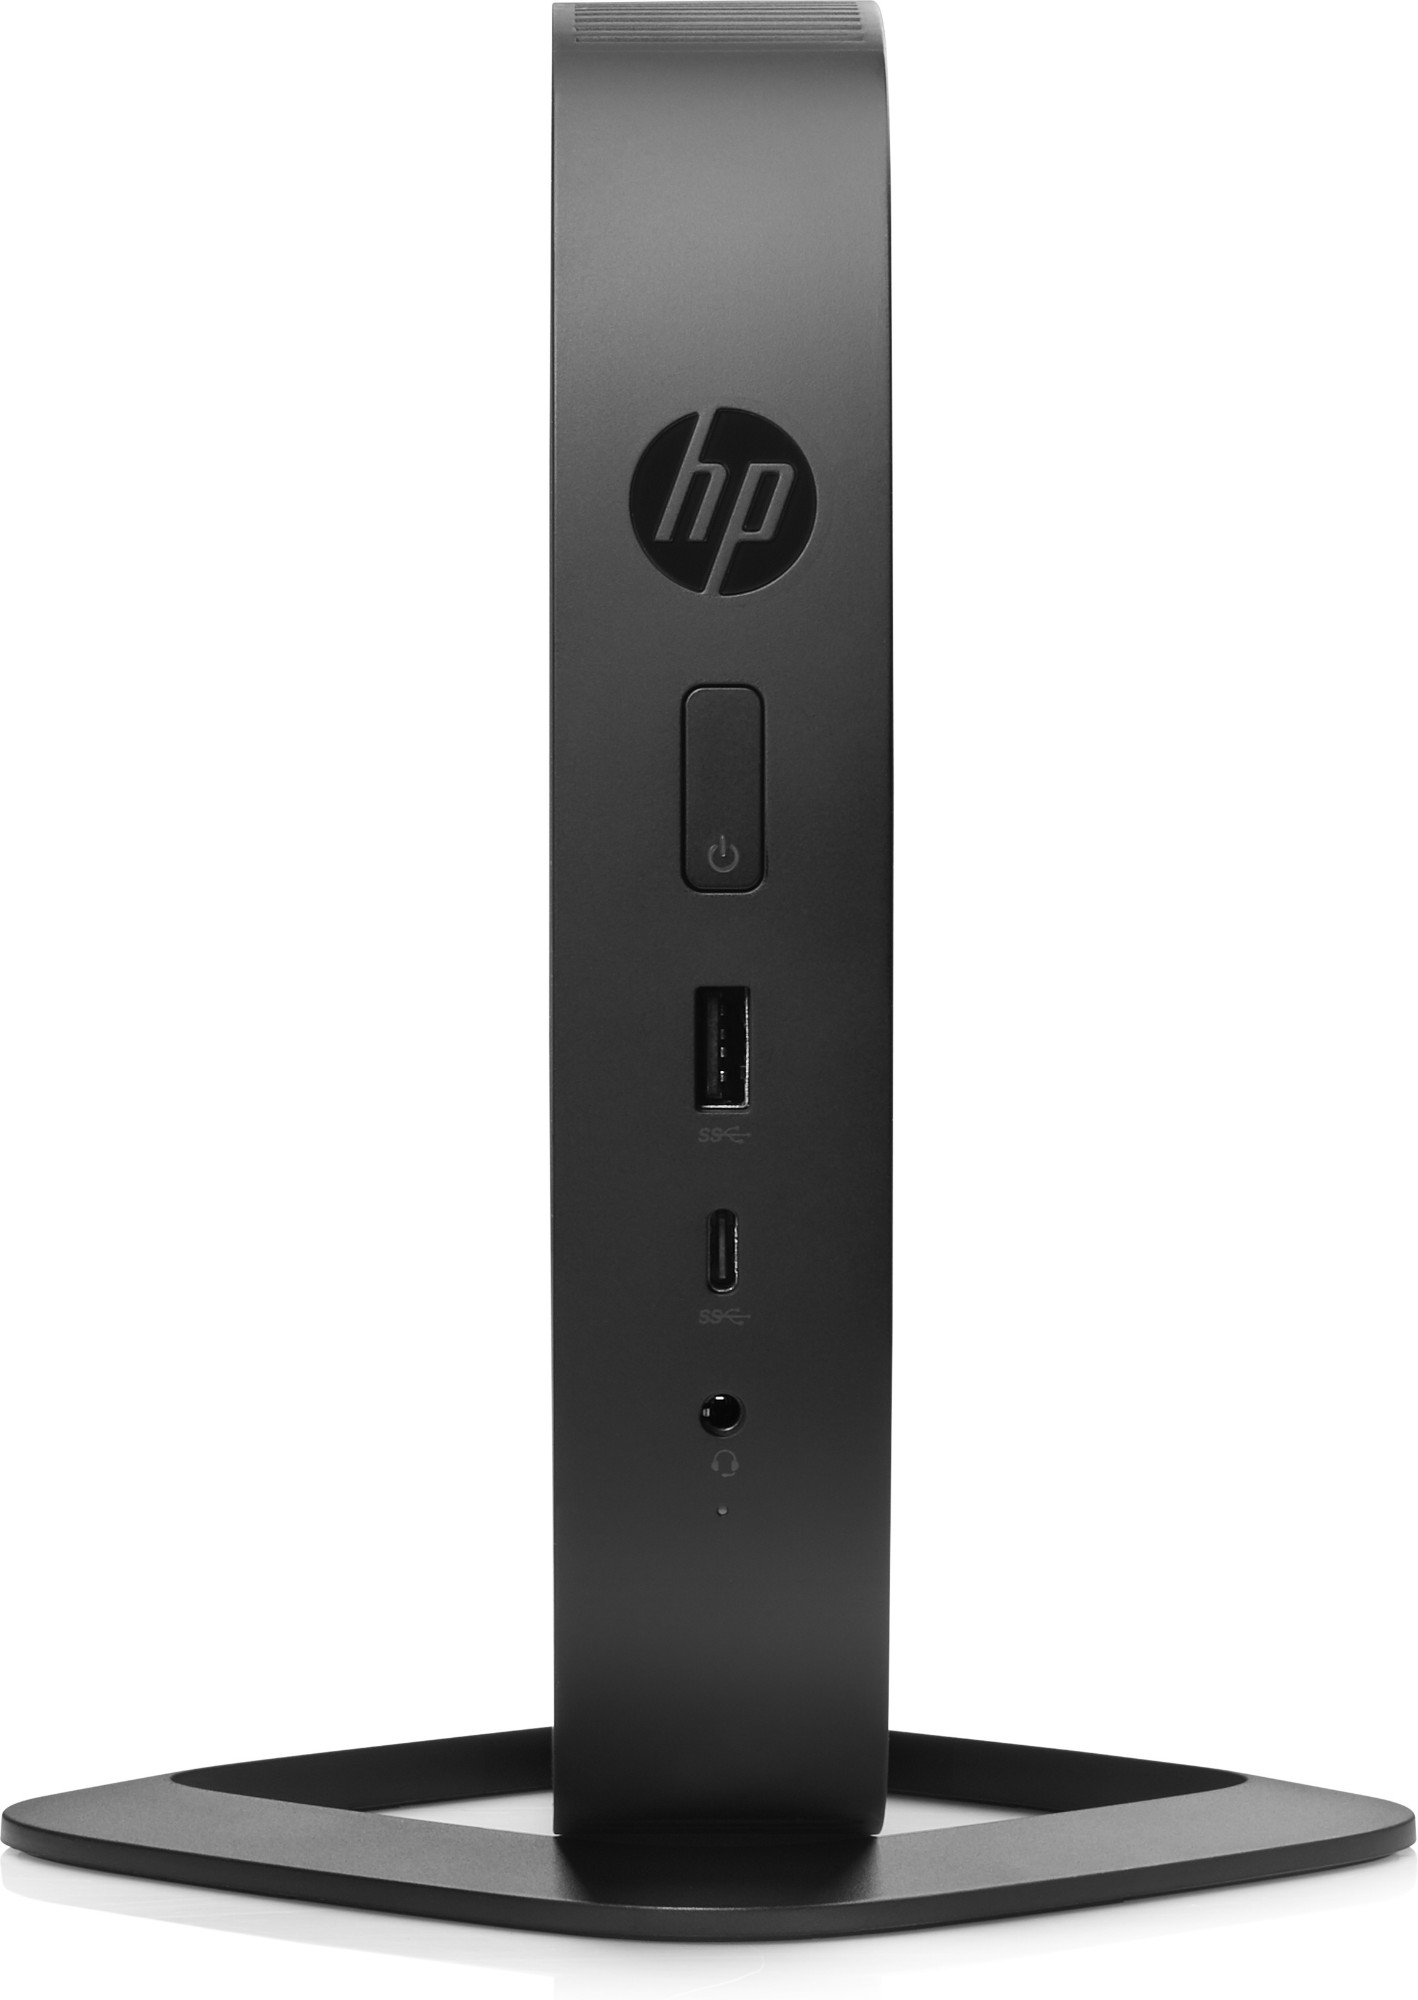 HP t530 1,5 GHz GX-215JJ Zwart 960 g